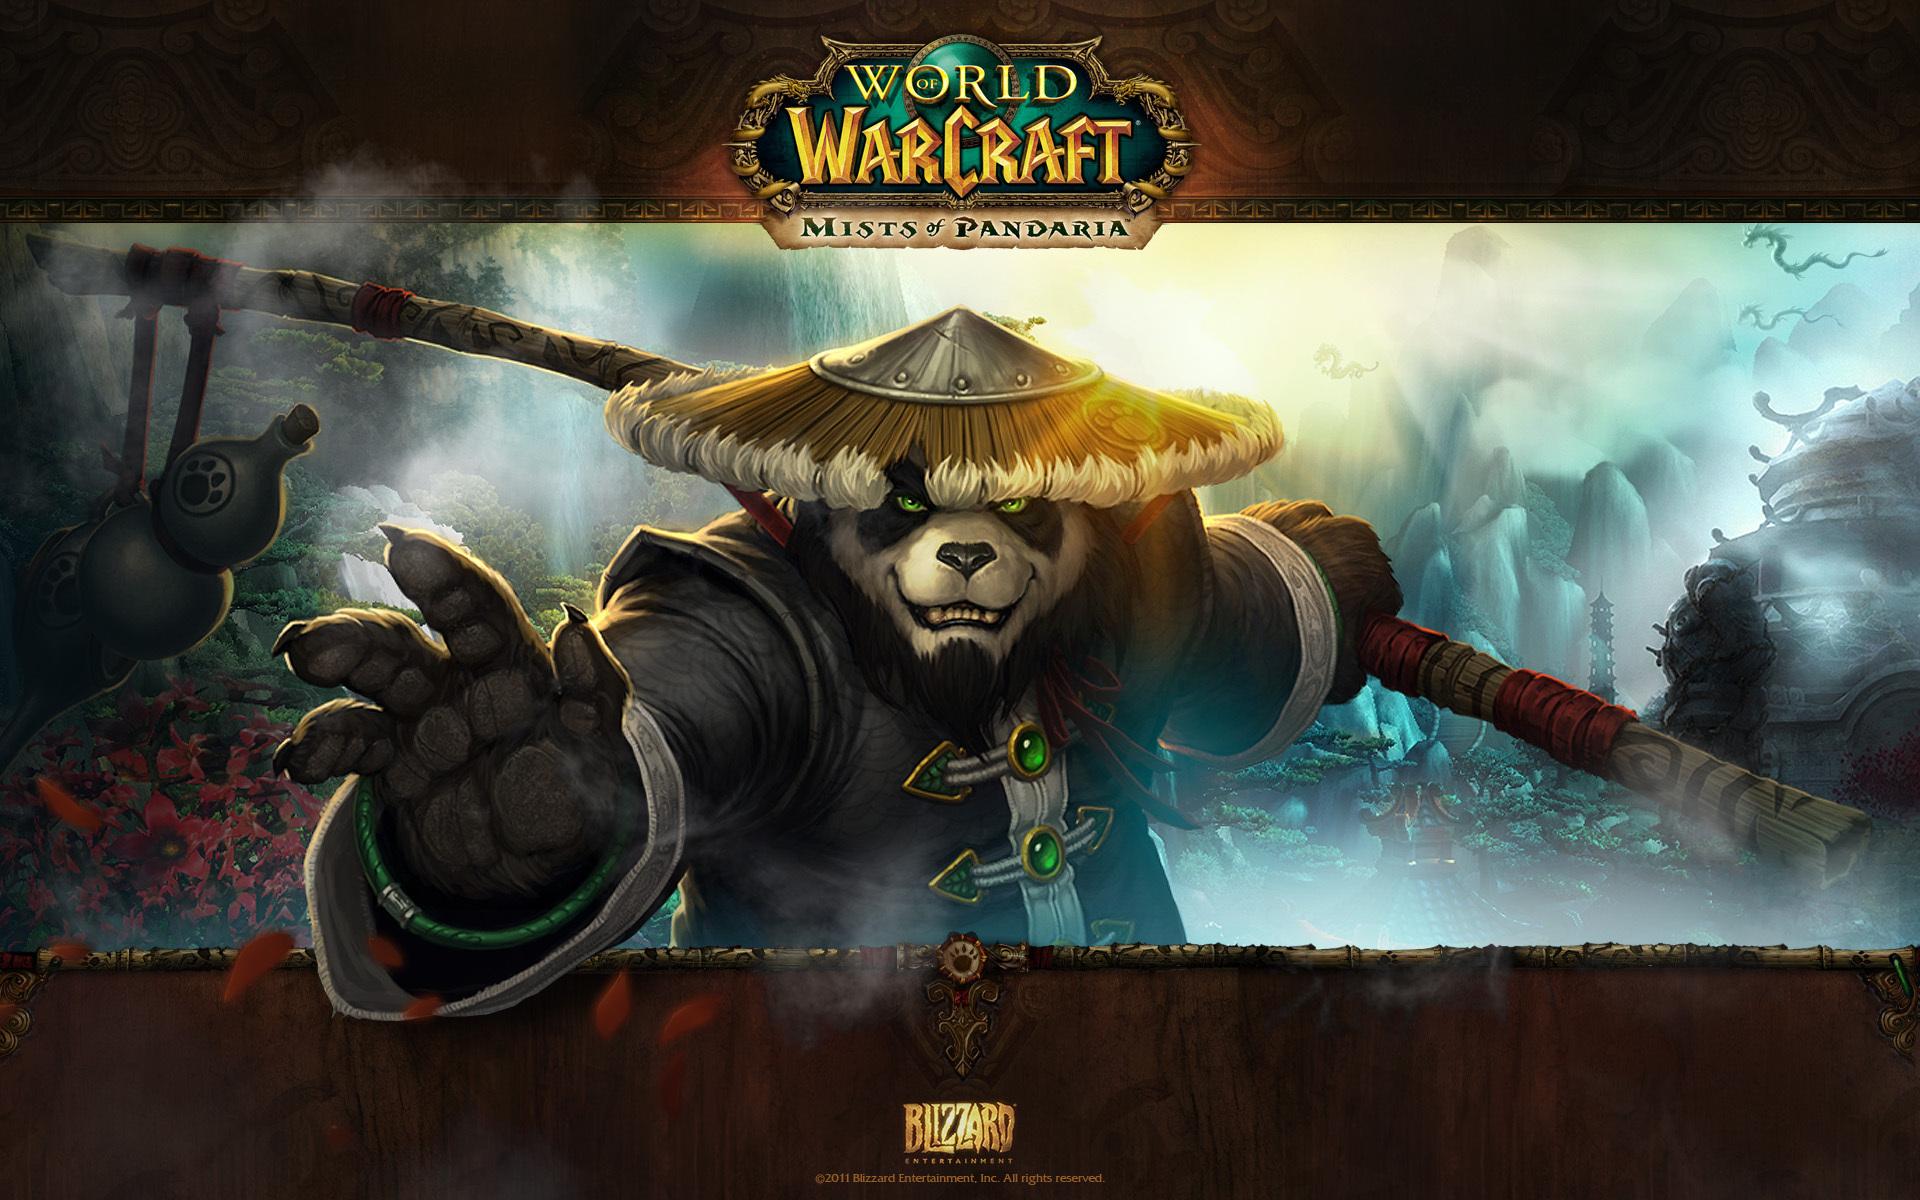 world of warcraft, wow, 2012